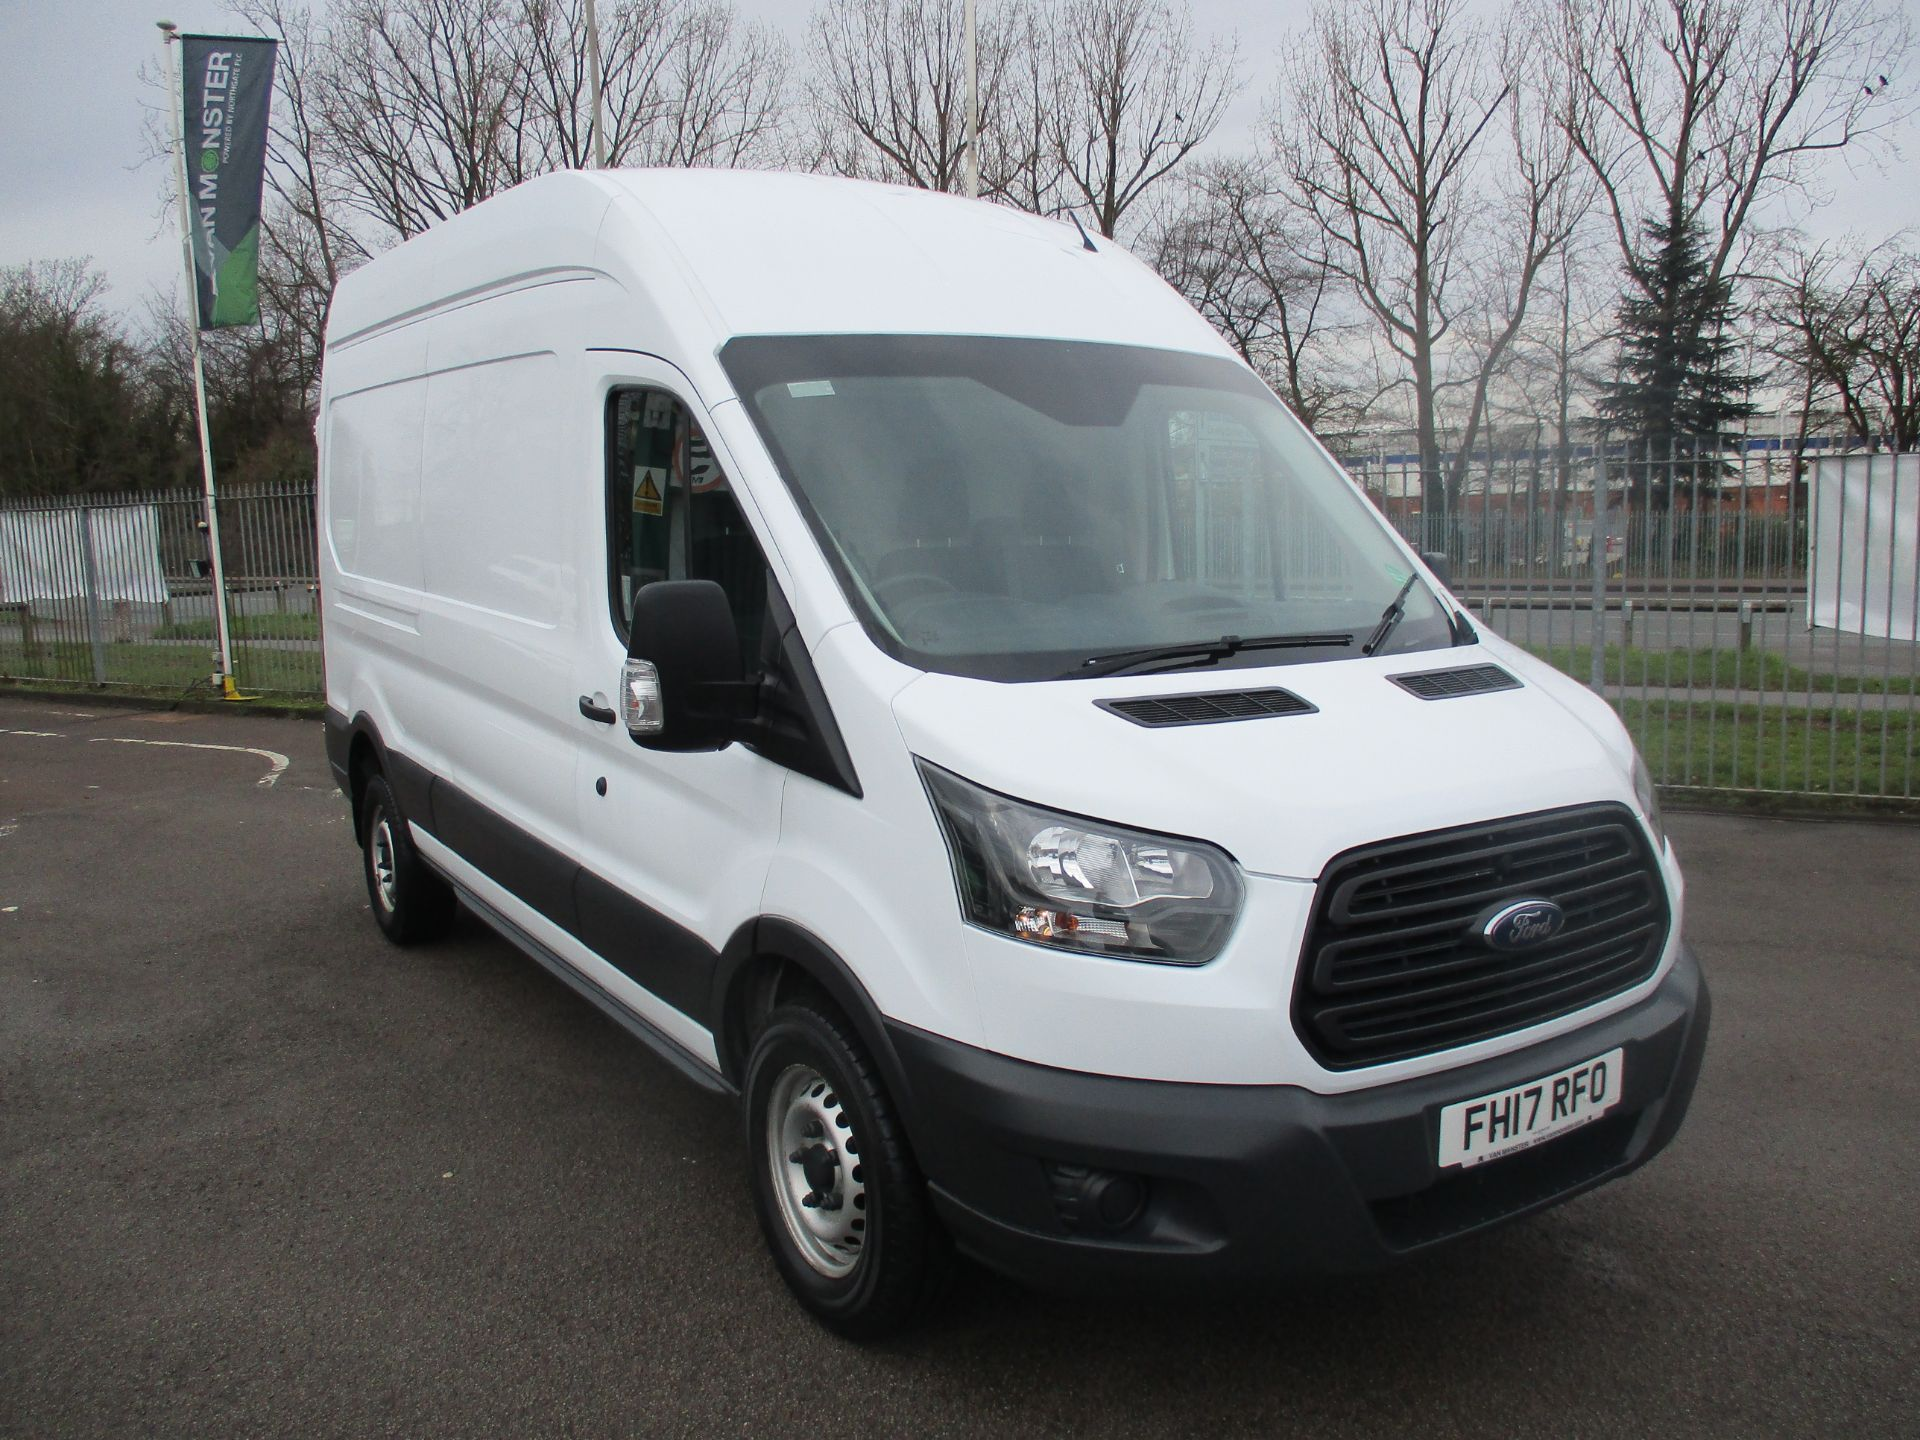 2017 Ford Transit L3 H3 VAN 130PS EURO 6 (FH17RFO)